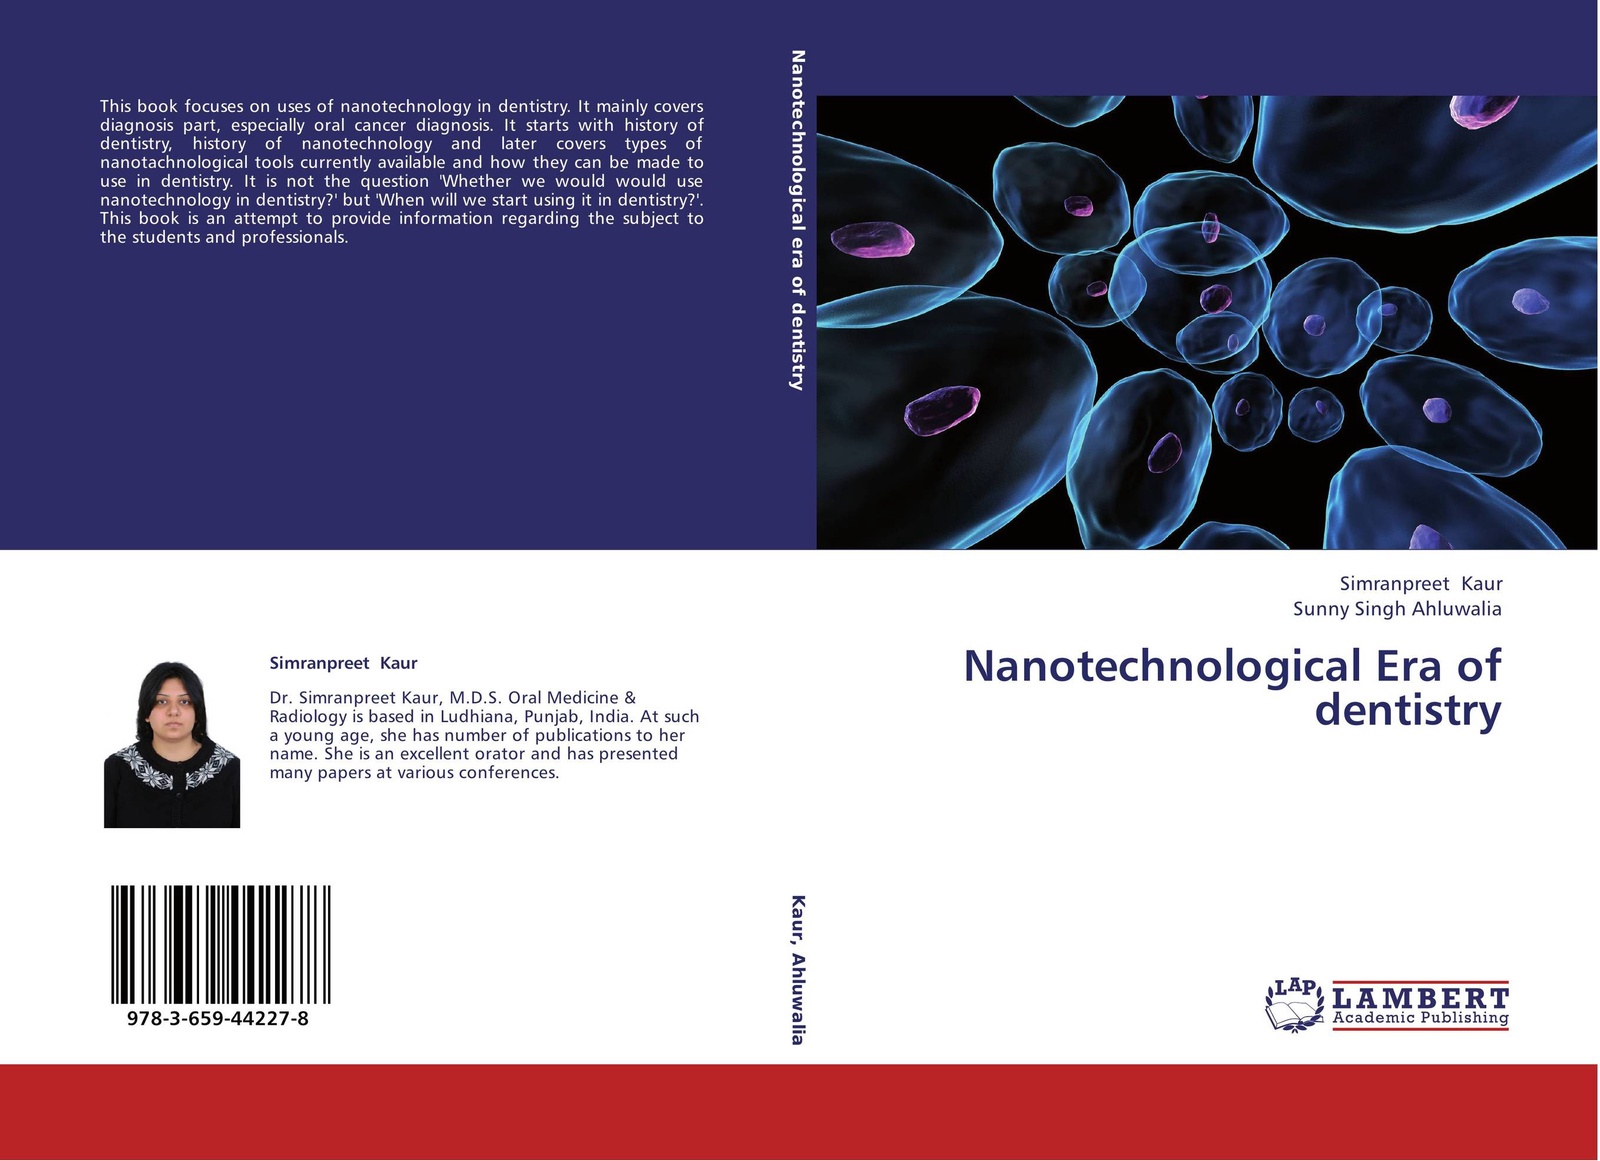 Simranpreet Kaur and Sunny Singh Ahluwalia Nanotechnological Era of dentistry laser dentistry